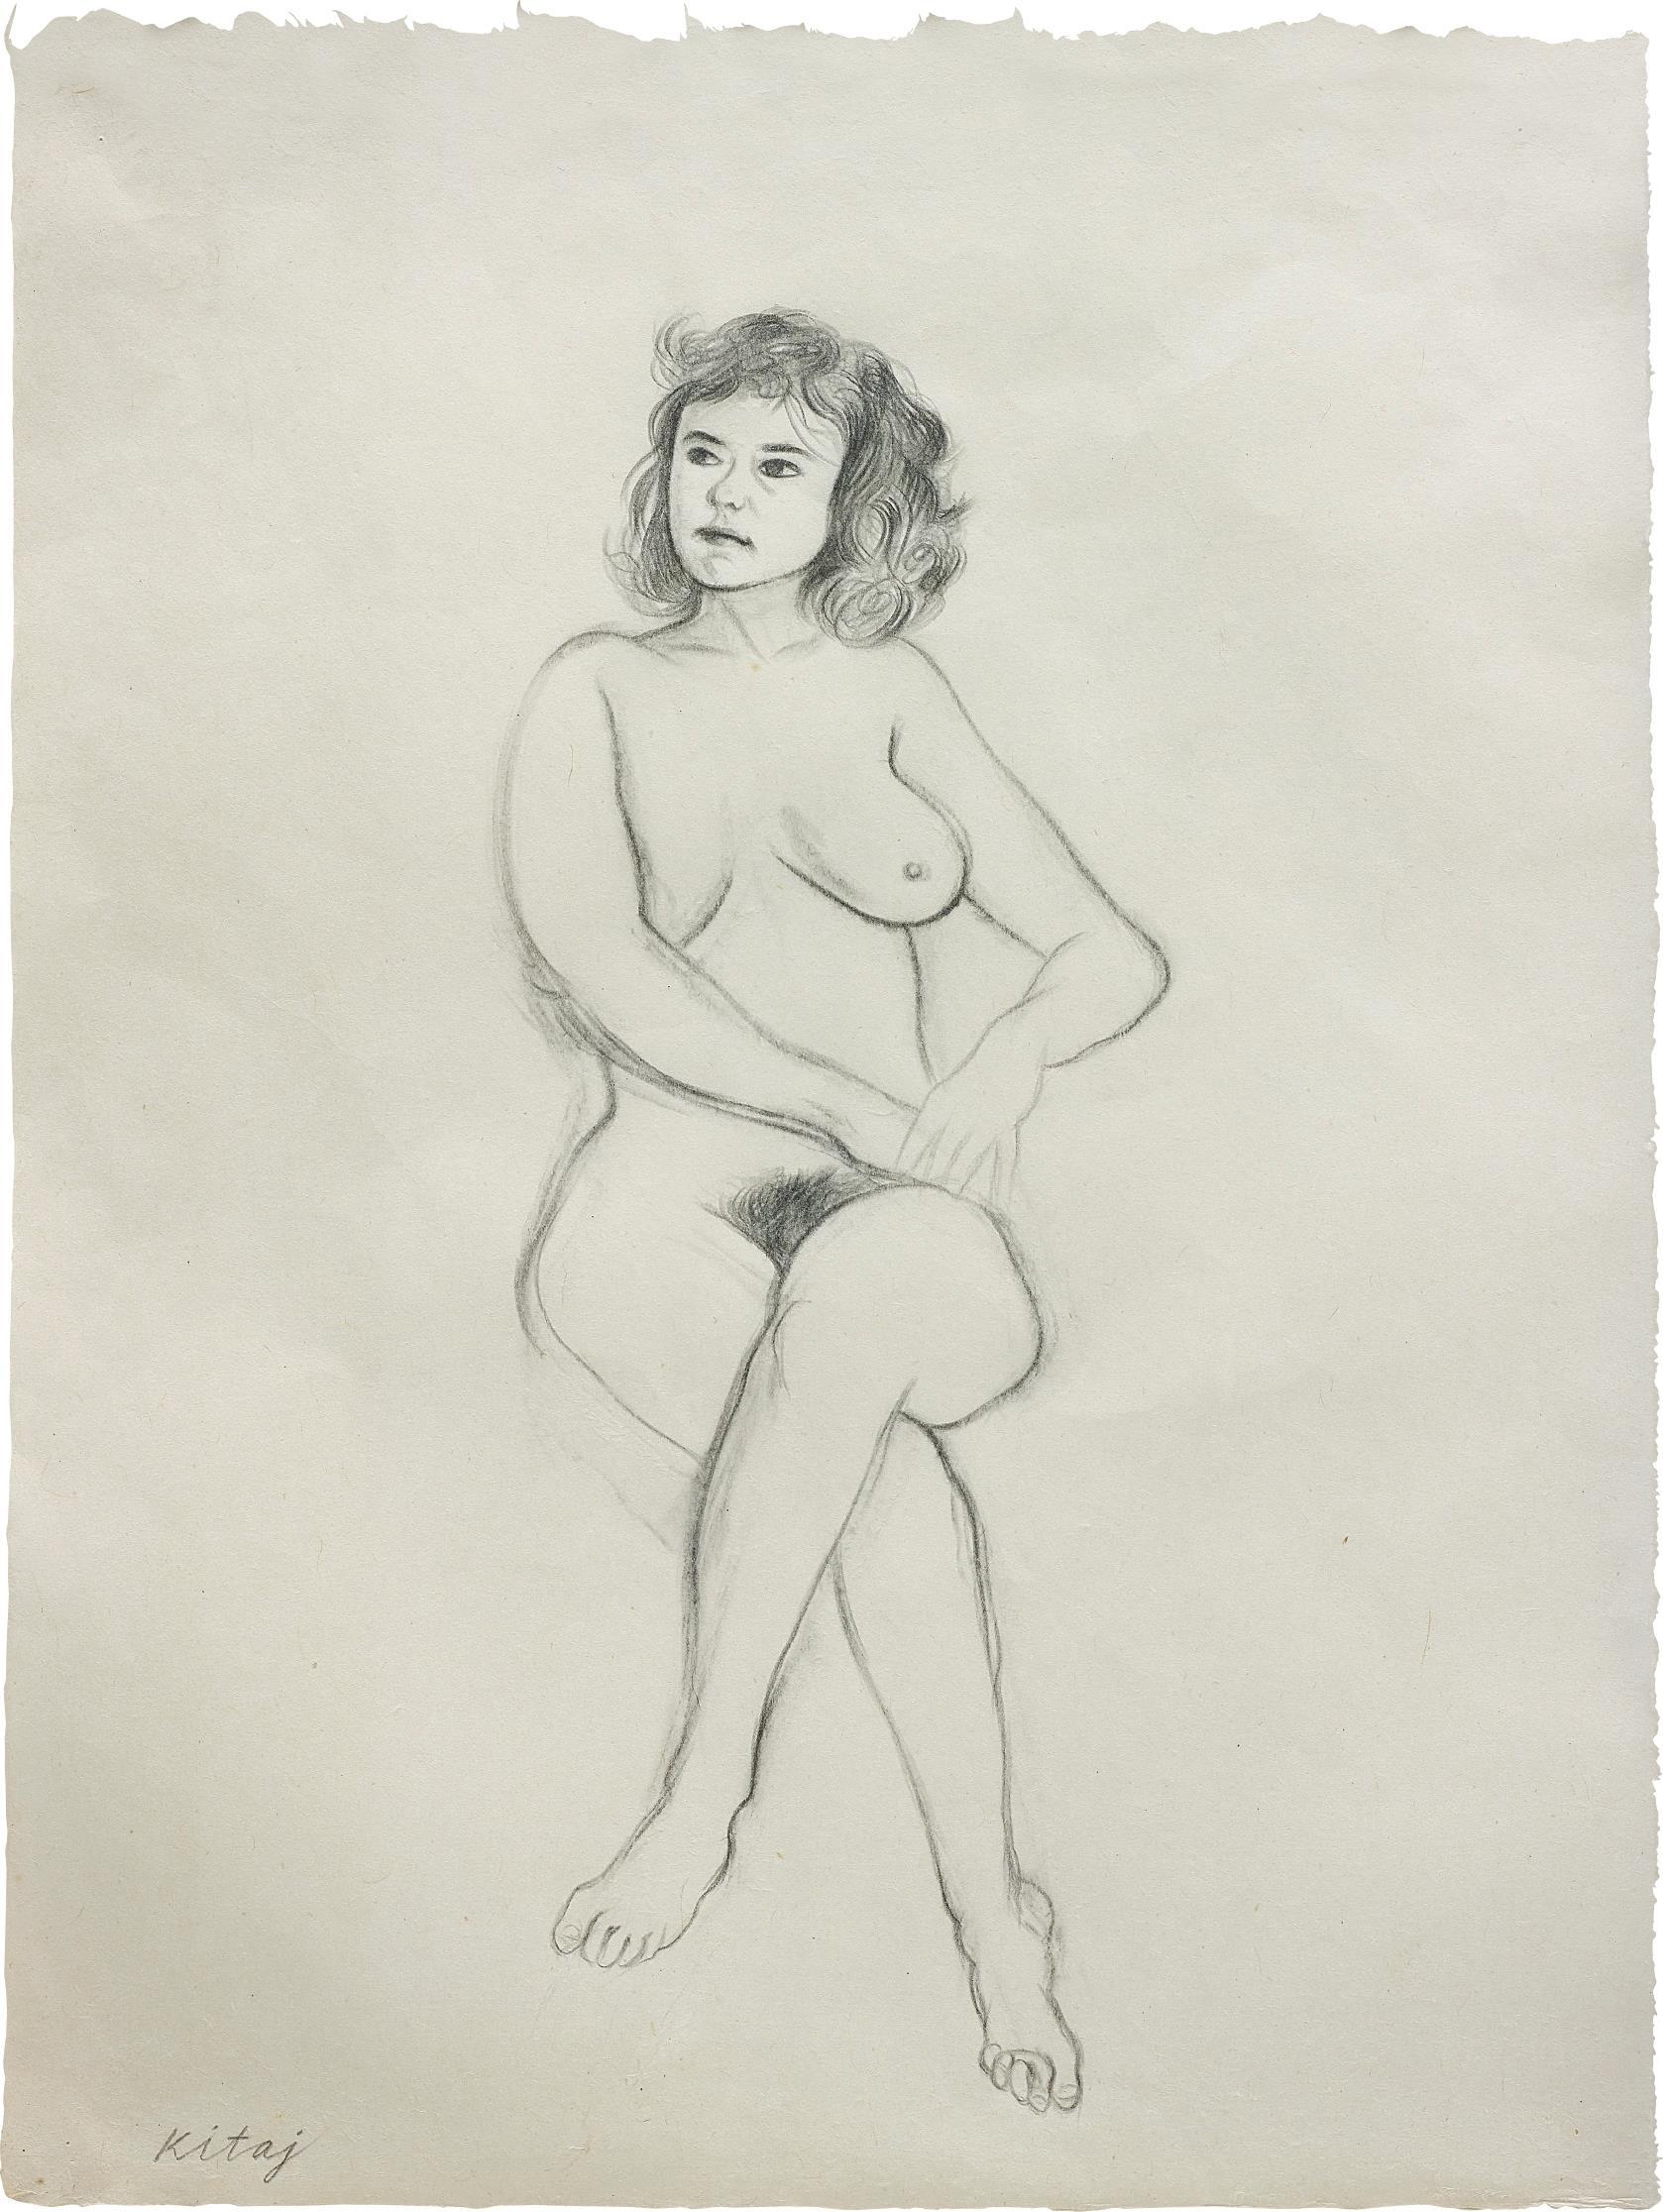 RB Kitaj-Lauren-1983